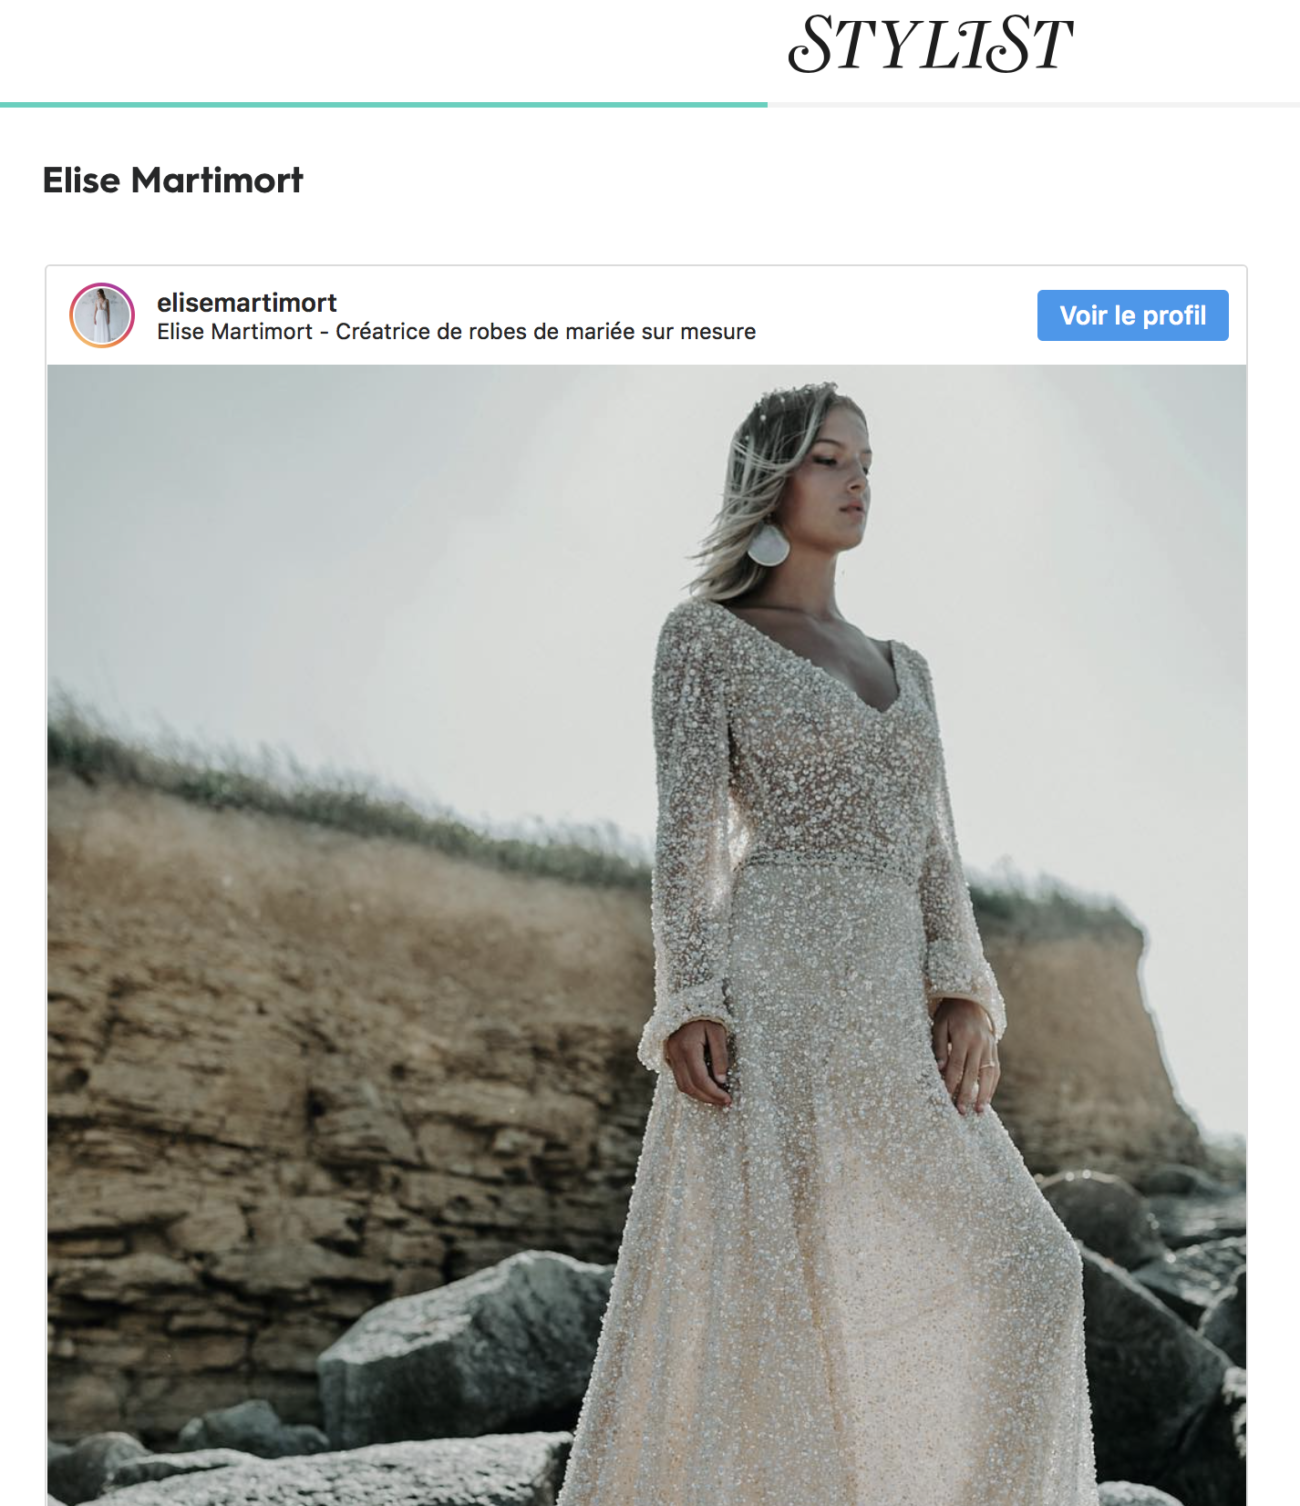 article stylist magazine presse feminine anglaise creatrice de robe de mariee sur mesure France elise Martimort